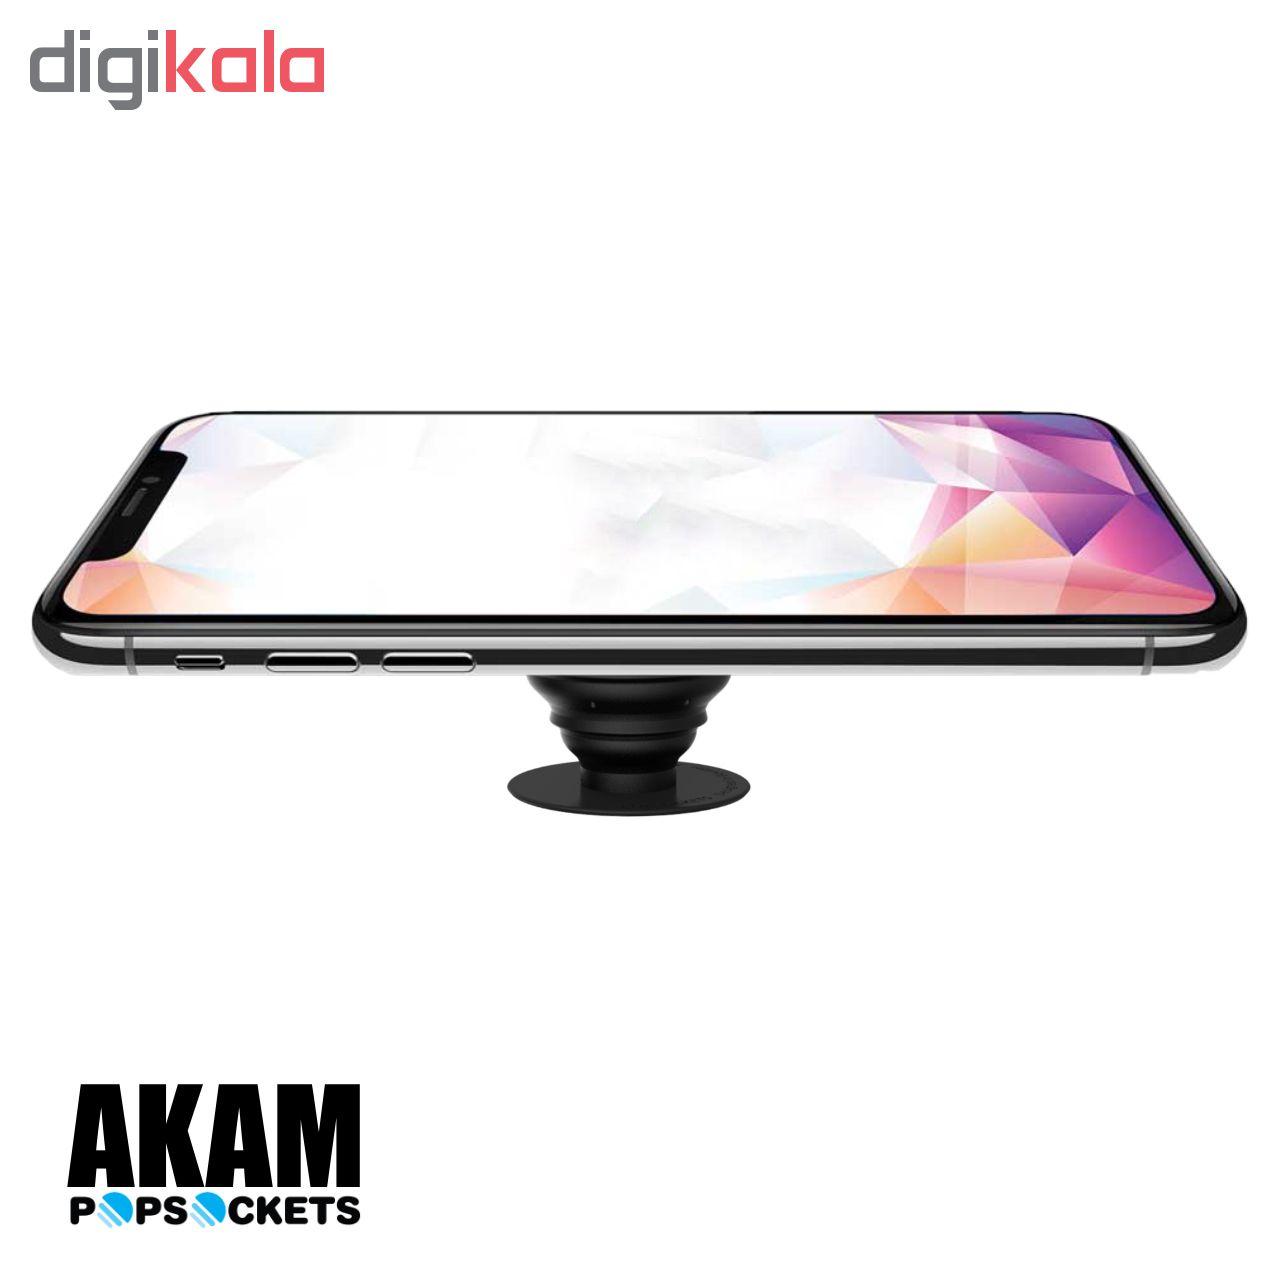 پایه نگهدارنده گوشی موبایل پاپ سوکت آکام مدل APS0061 main 1 10